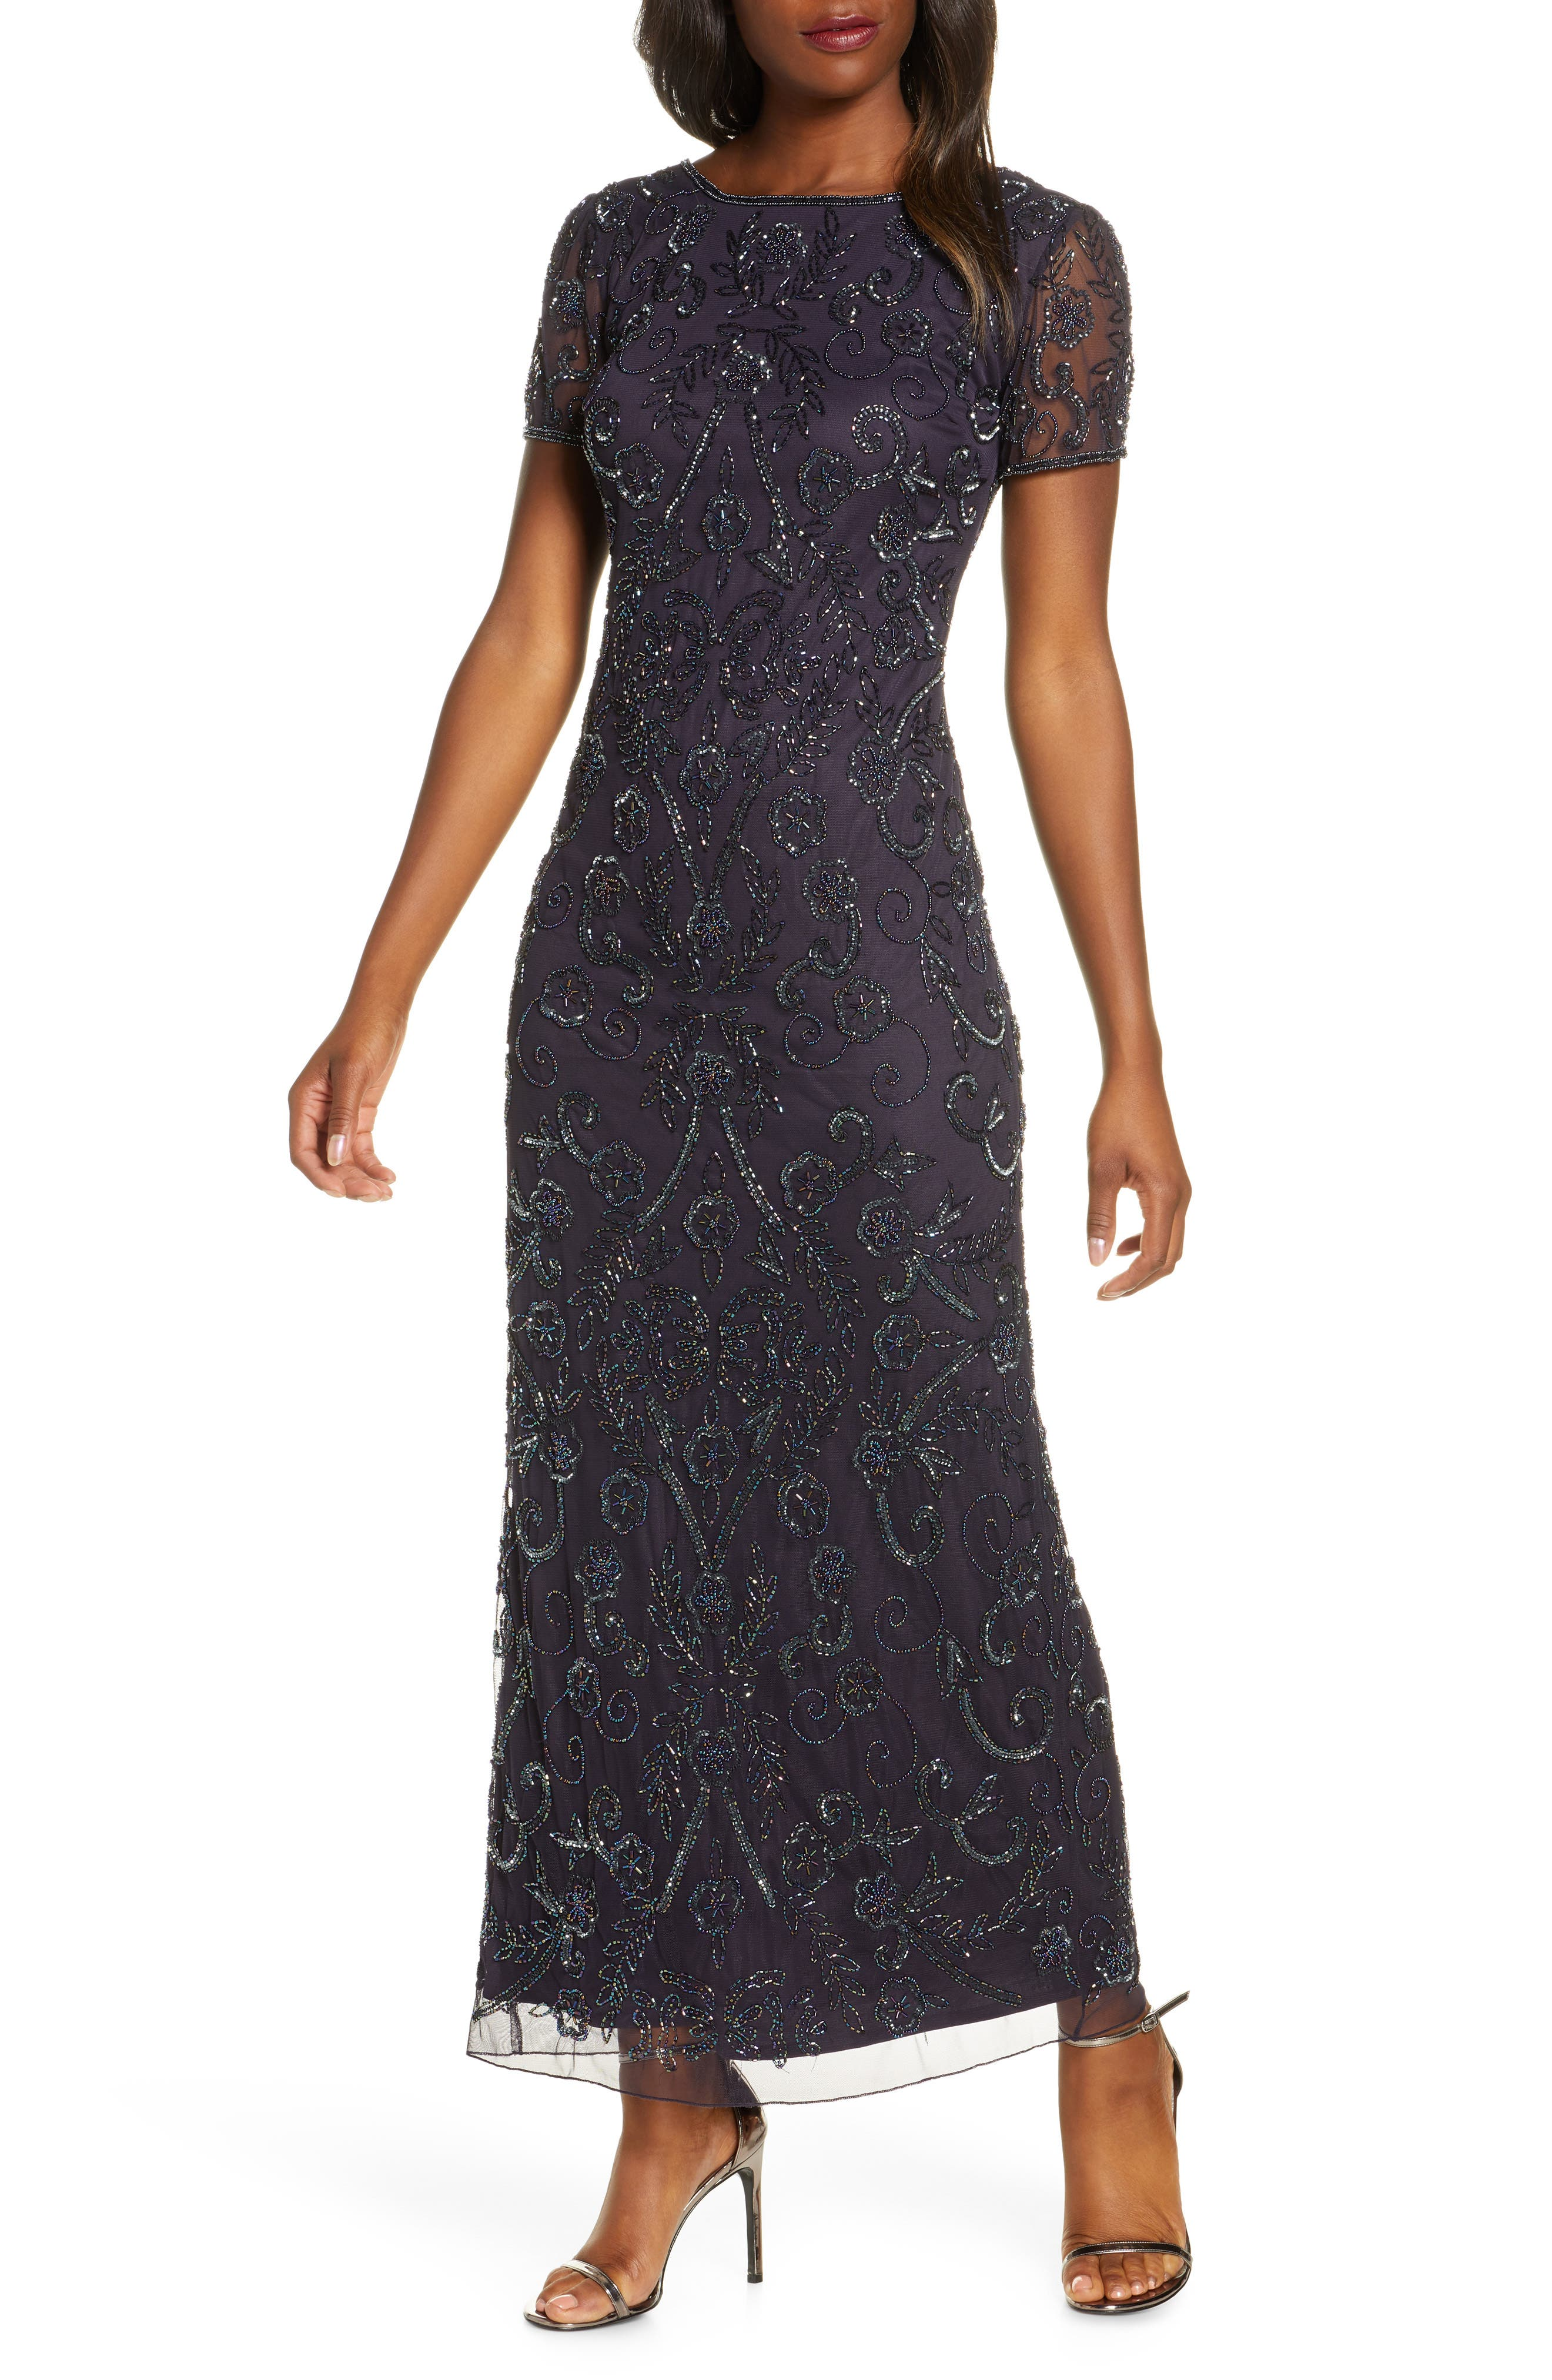 Vintage 1920s Dresses – Where to Buy Womens Pisarro Nights Embellished Mesh Evening Dress Size 12 - Purple $208.00 AT vintagedancer.com